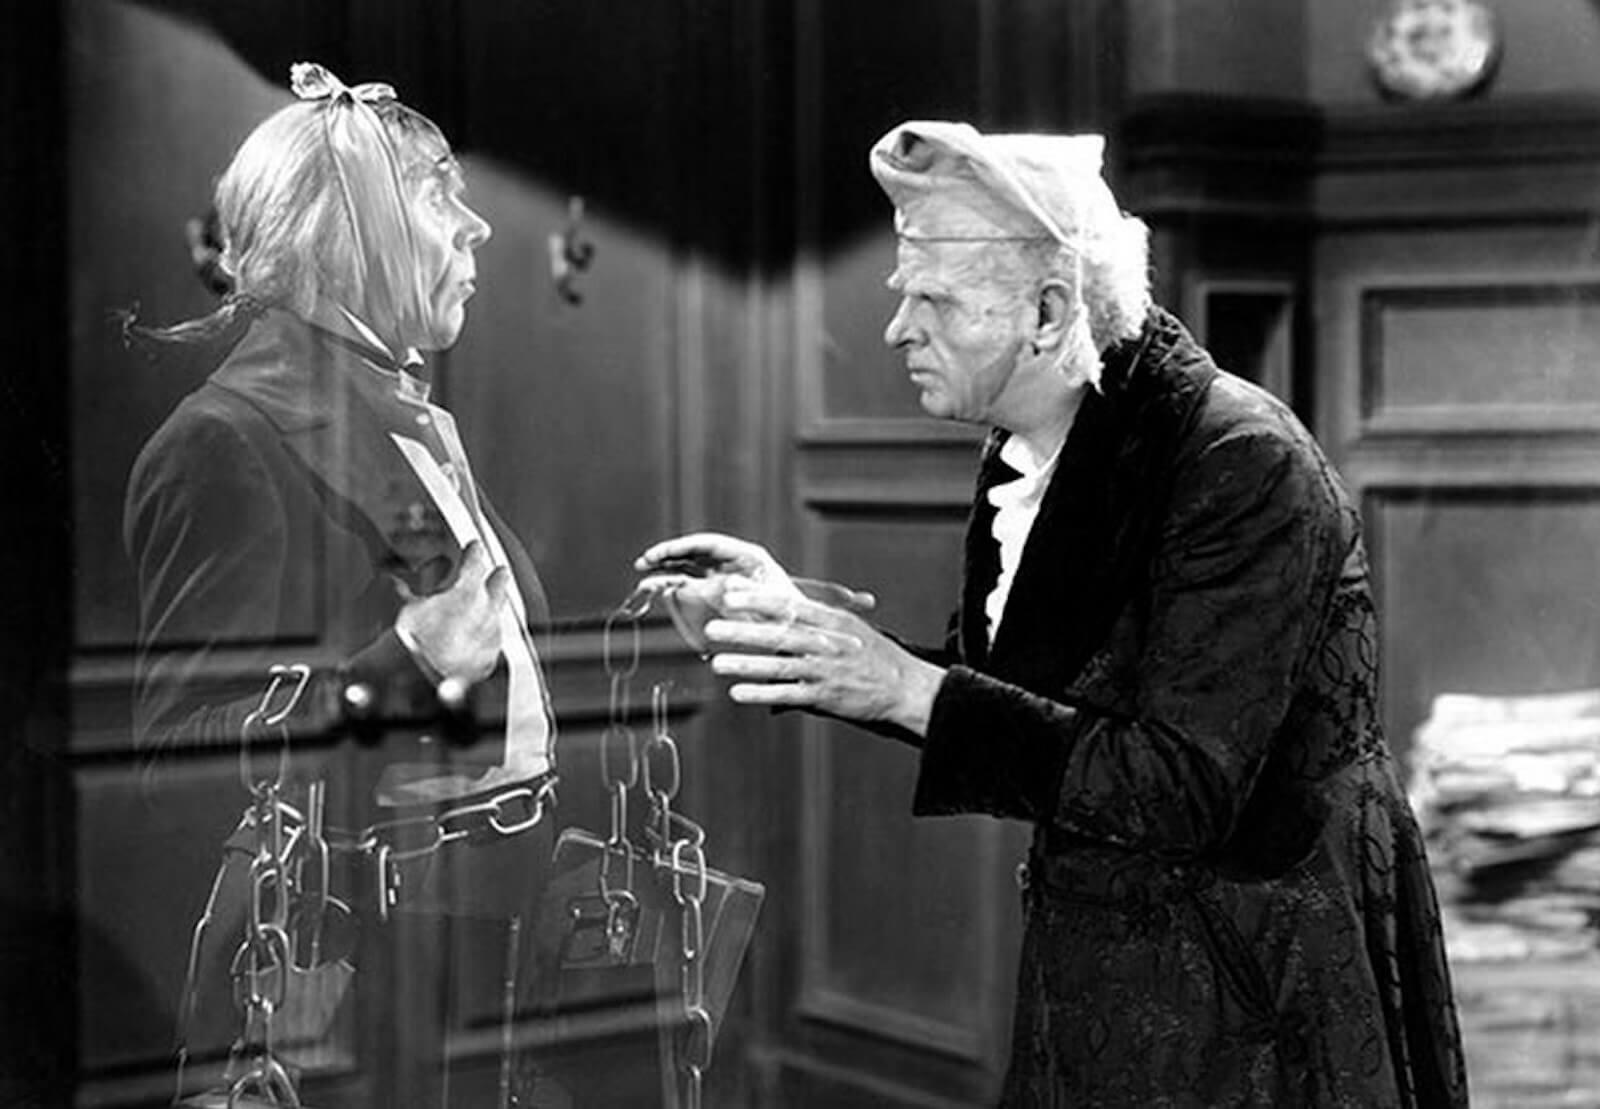 Character Development - Ebenezer Scrooge